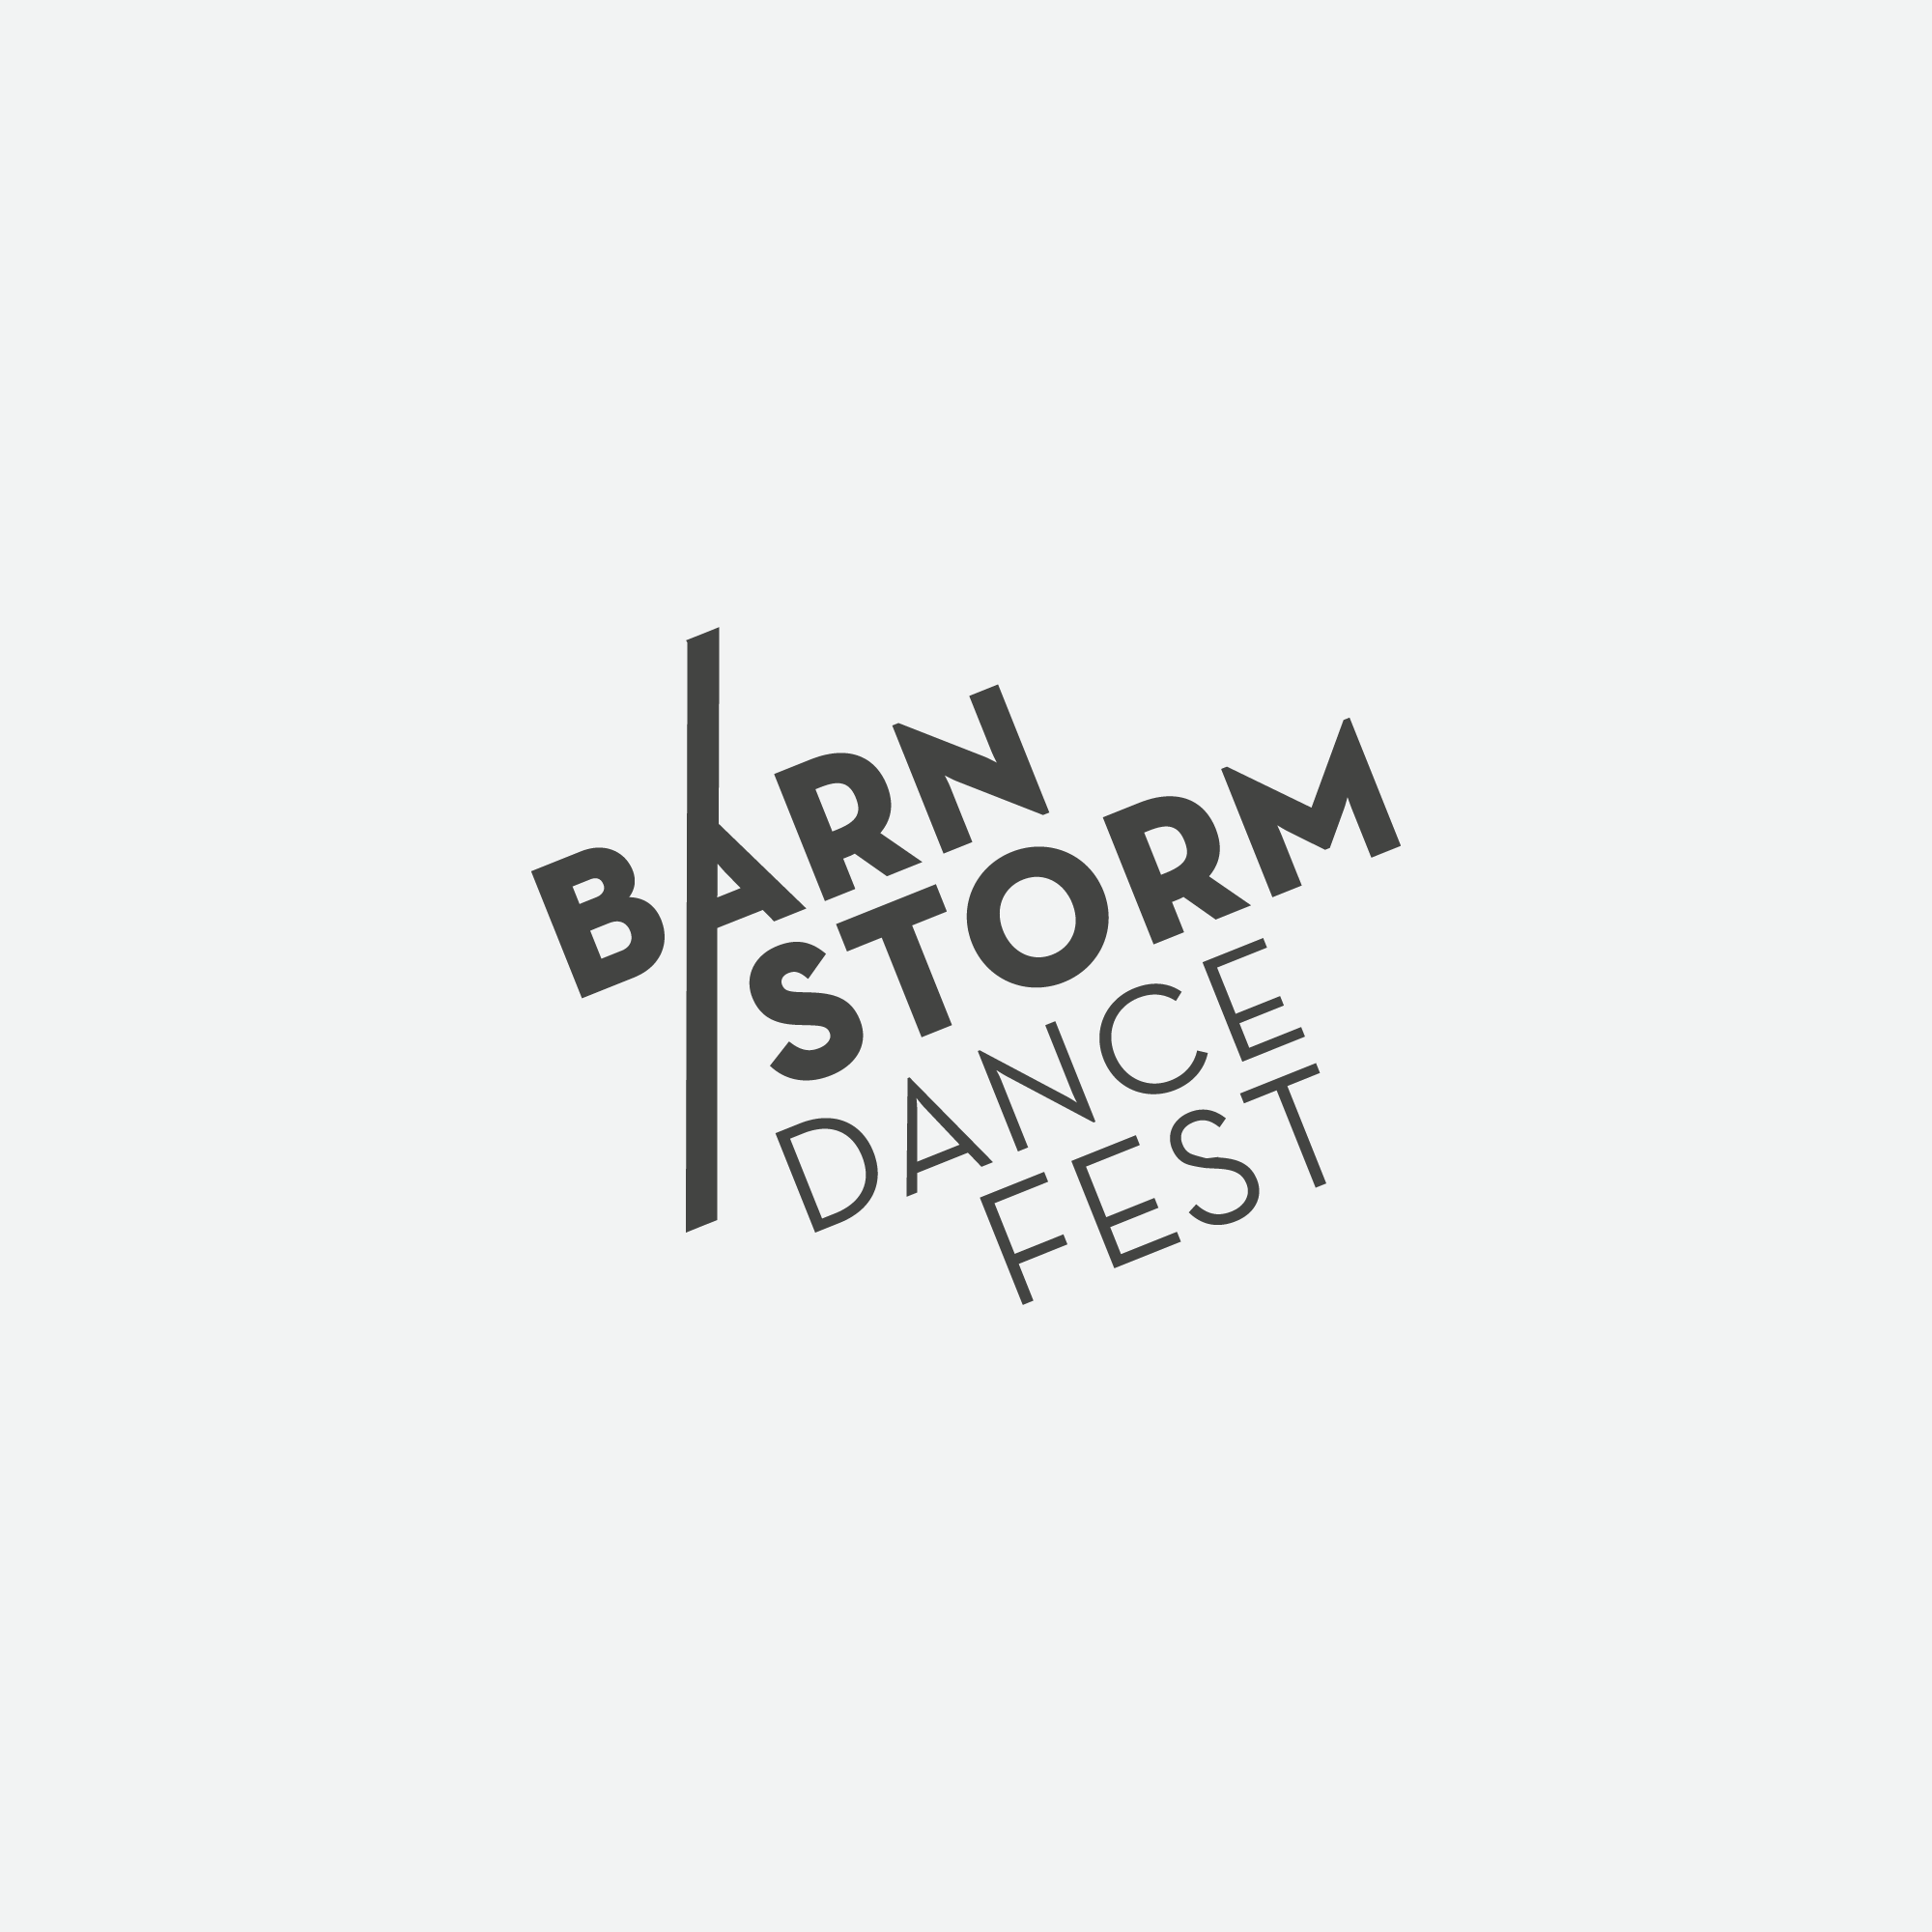 Barnstorm | Dance Source, 2014